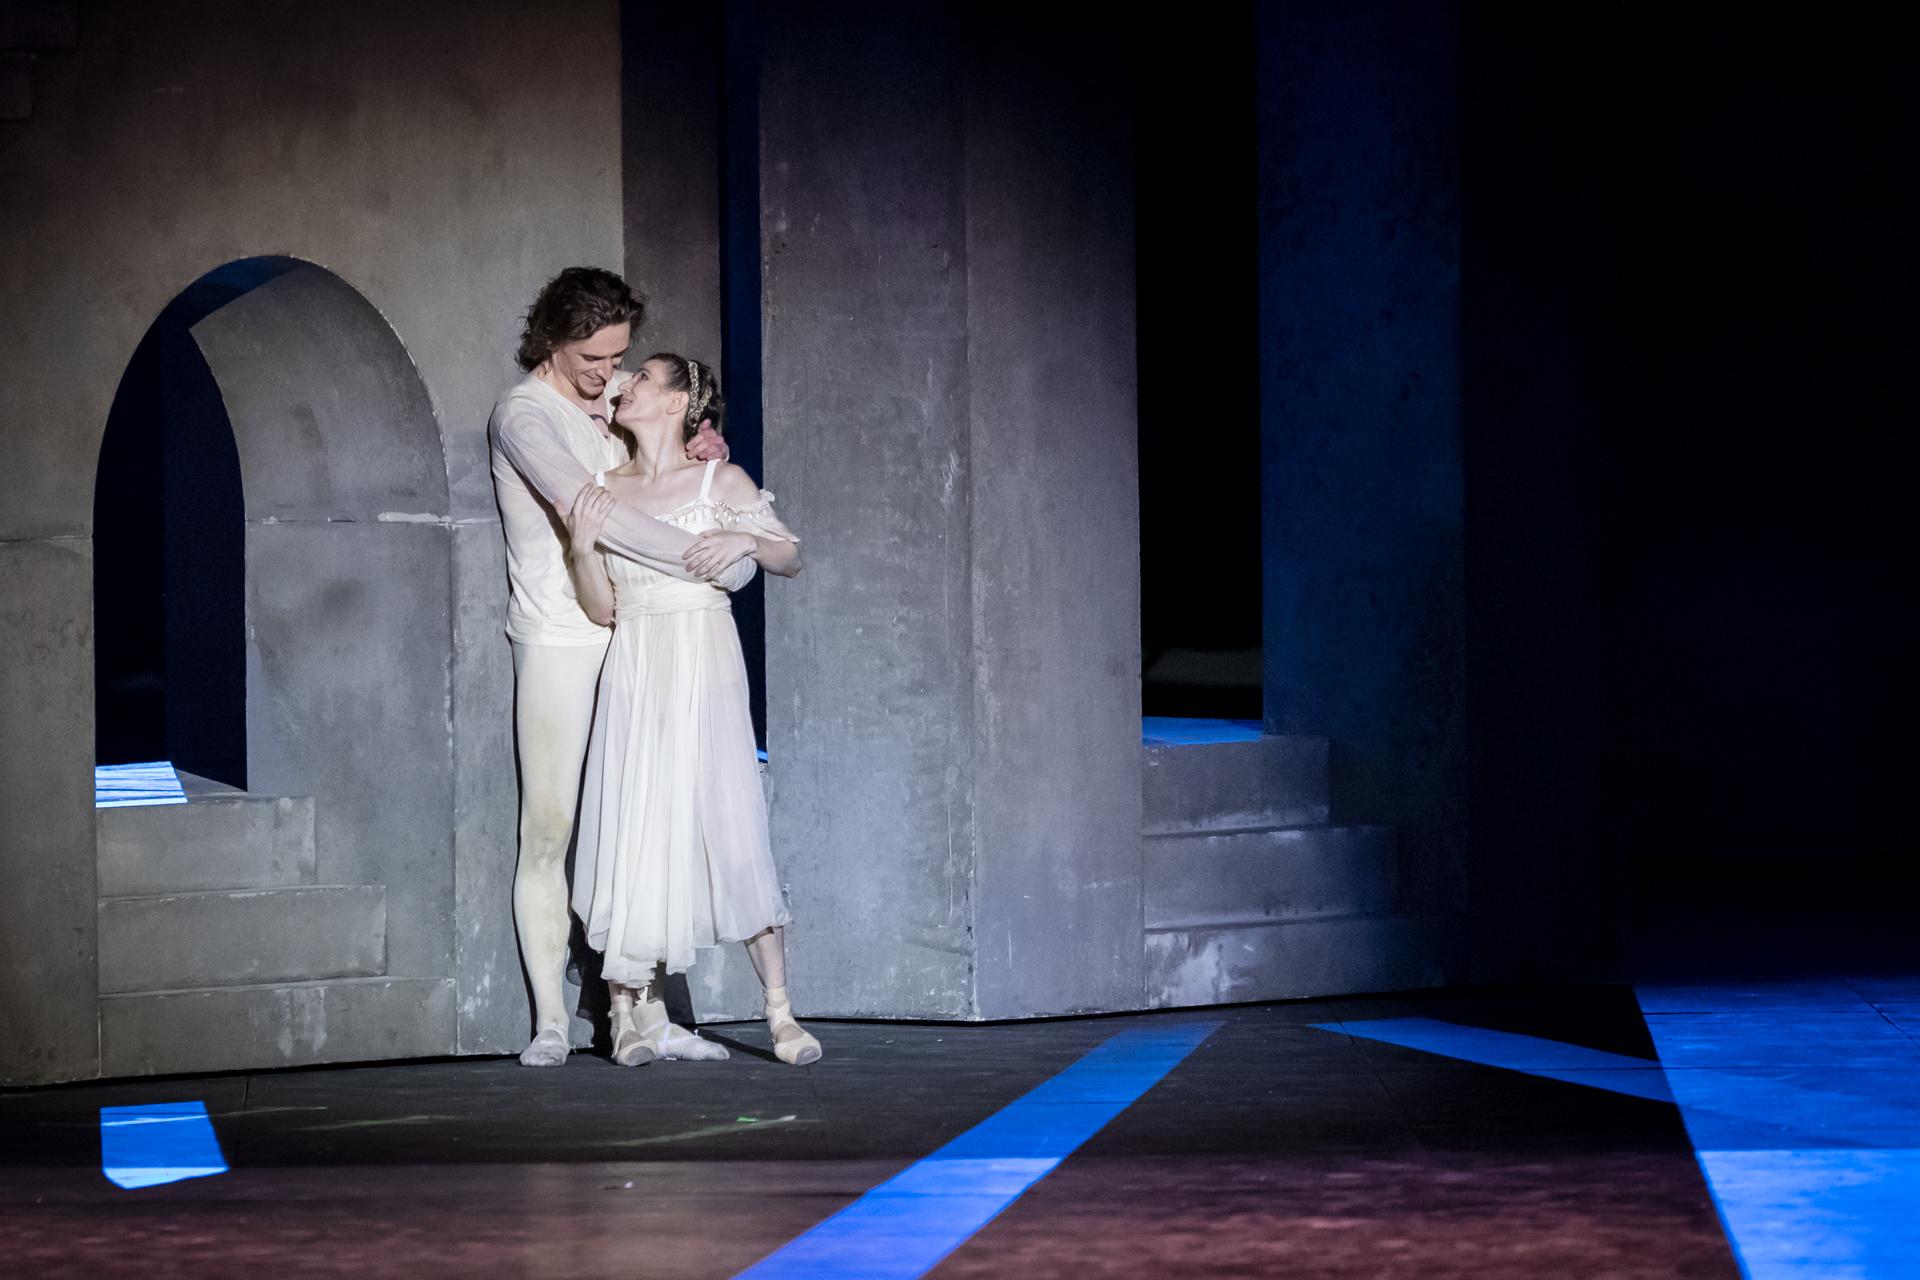 2019_08_26-Romeo-and-Juliet-©-Luca-Vantusso-215510-5D4B0649